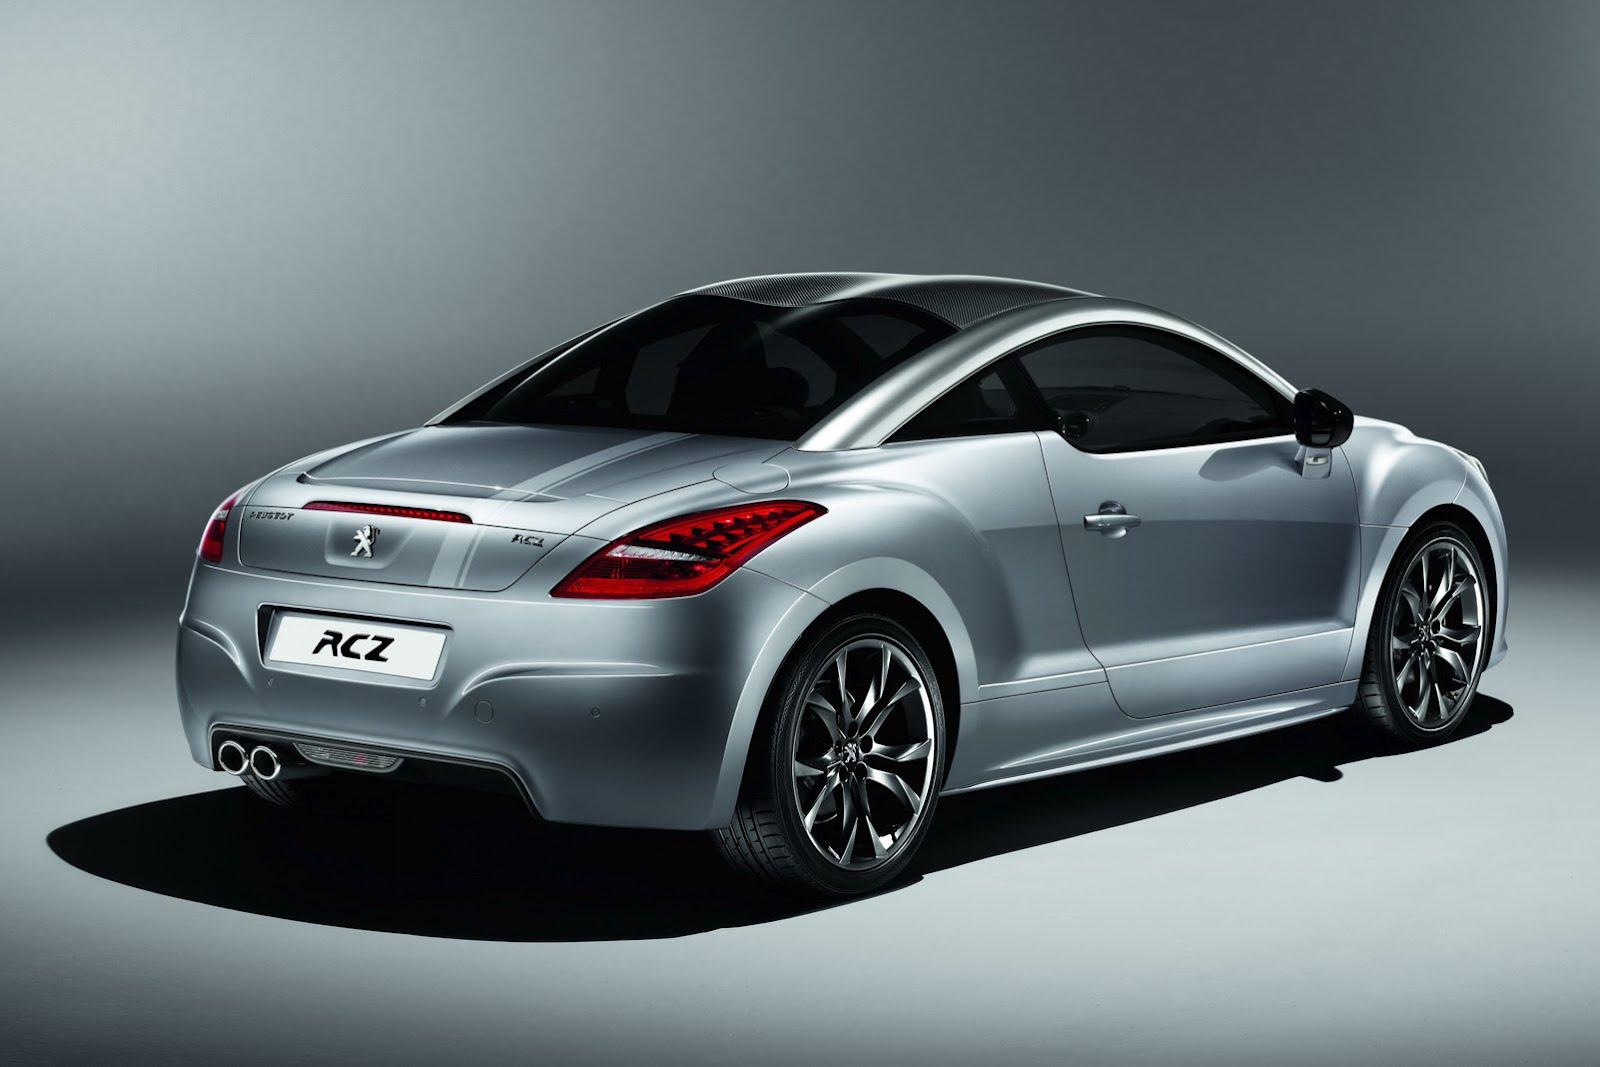 Peugeot выпустил спецверсию модели RCZ — Onyx